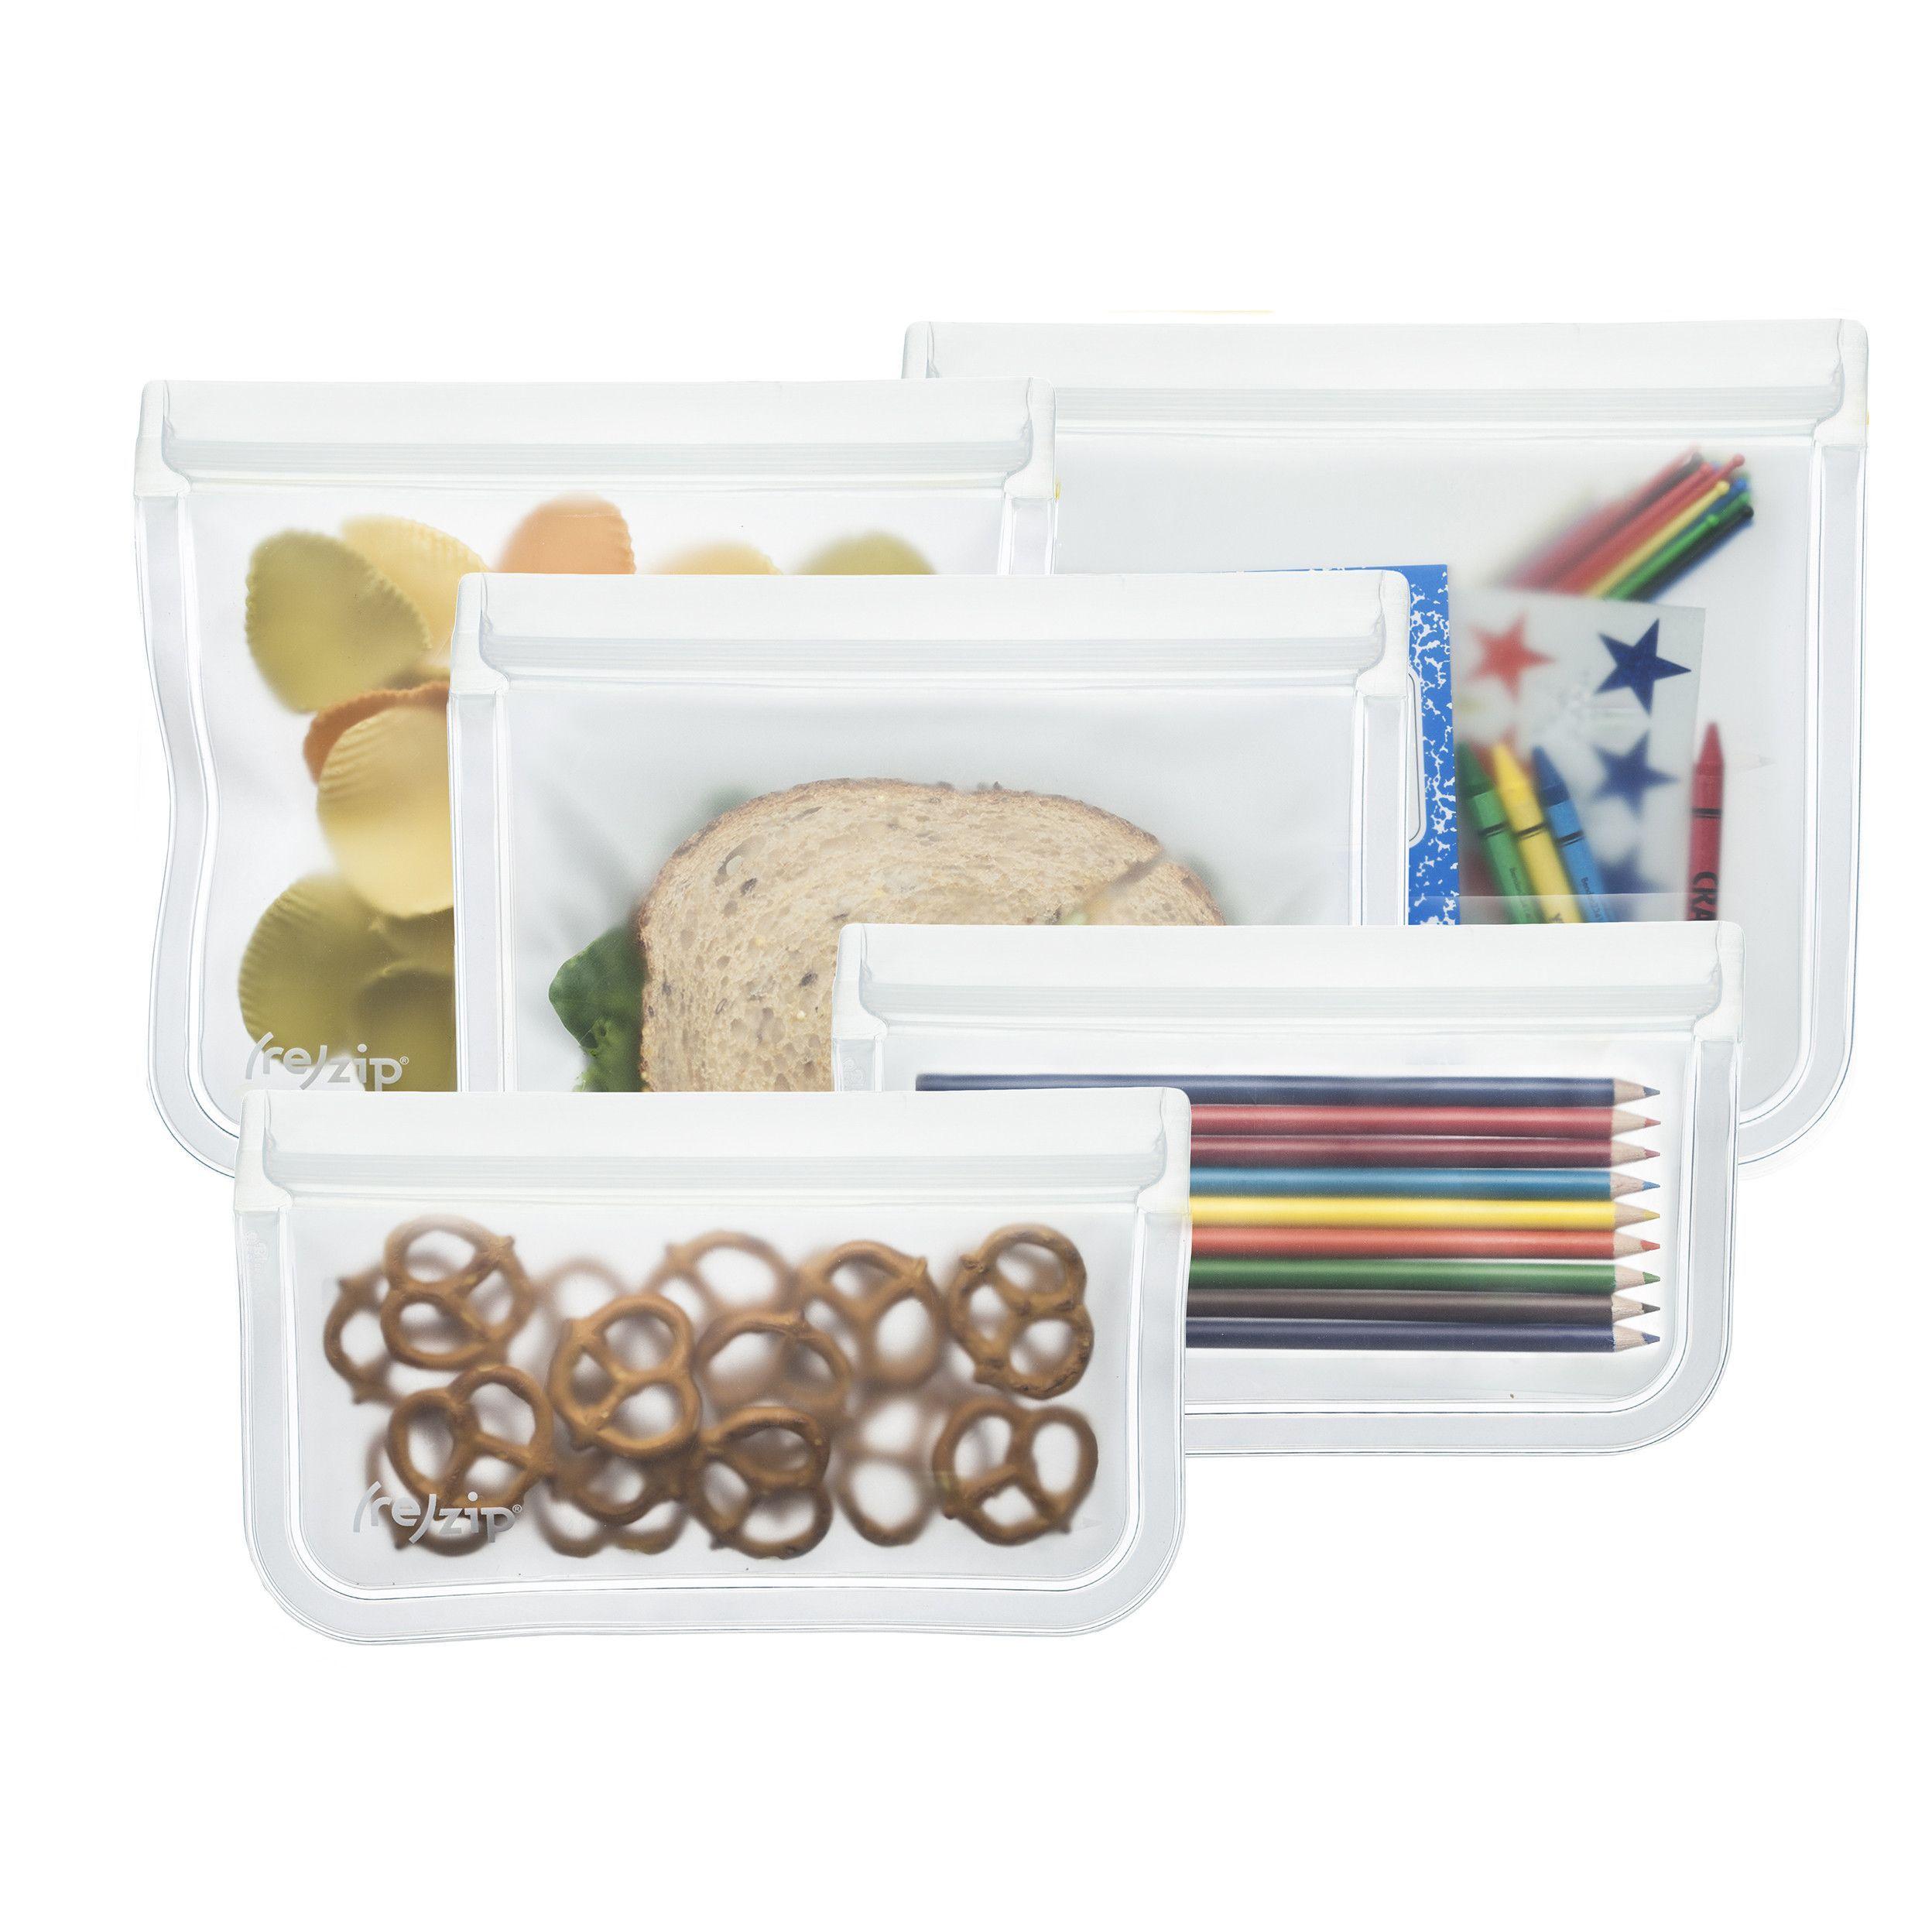 193dd7382d0 re)zip 5-Piece Lay-Flat Starter Leakproof Reusable Storage Bag Kit ...